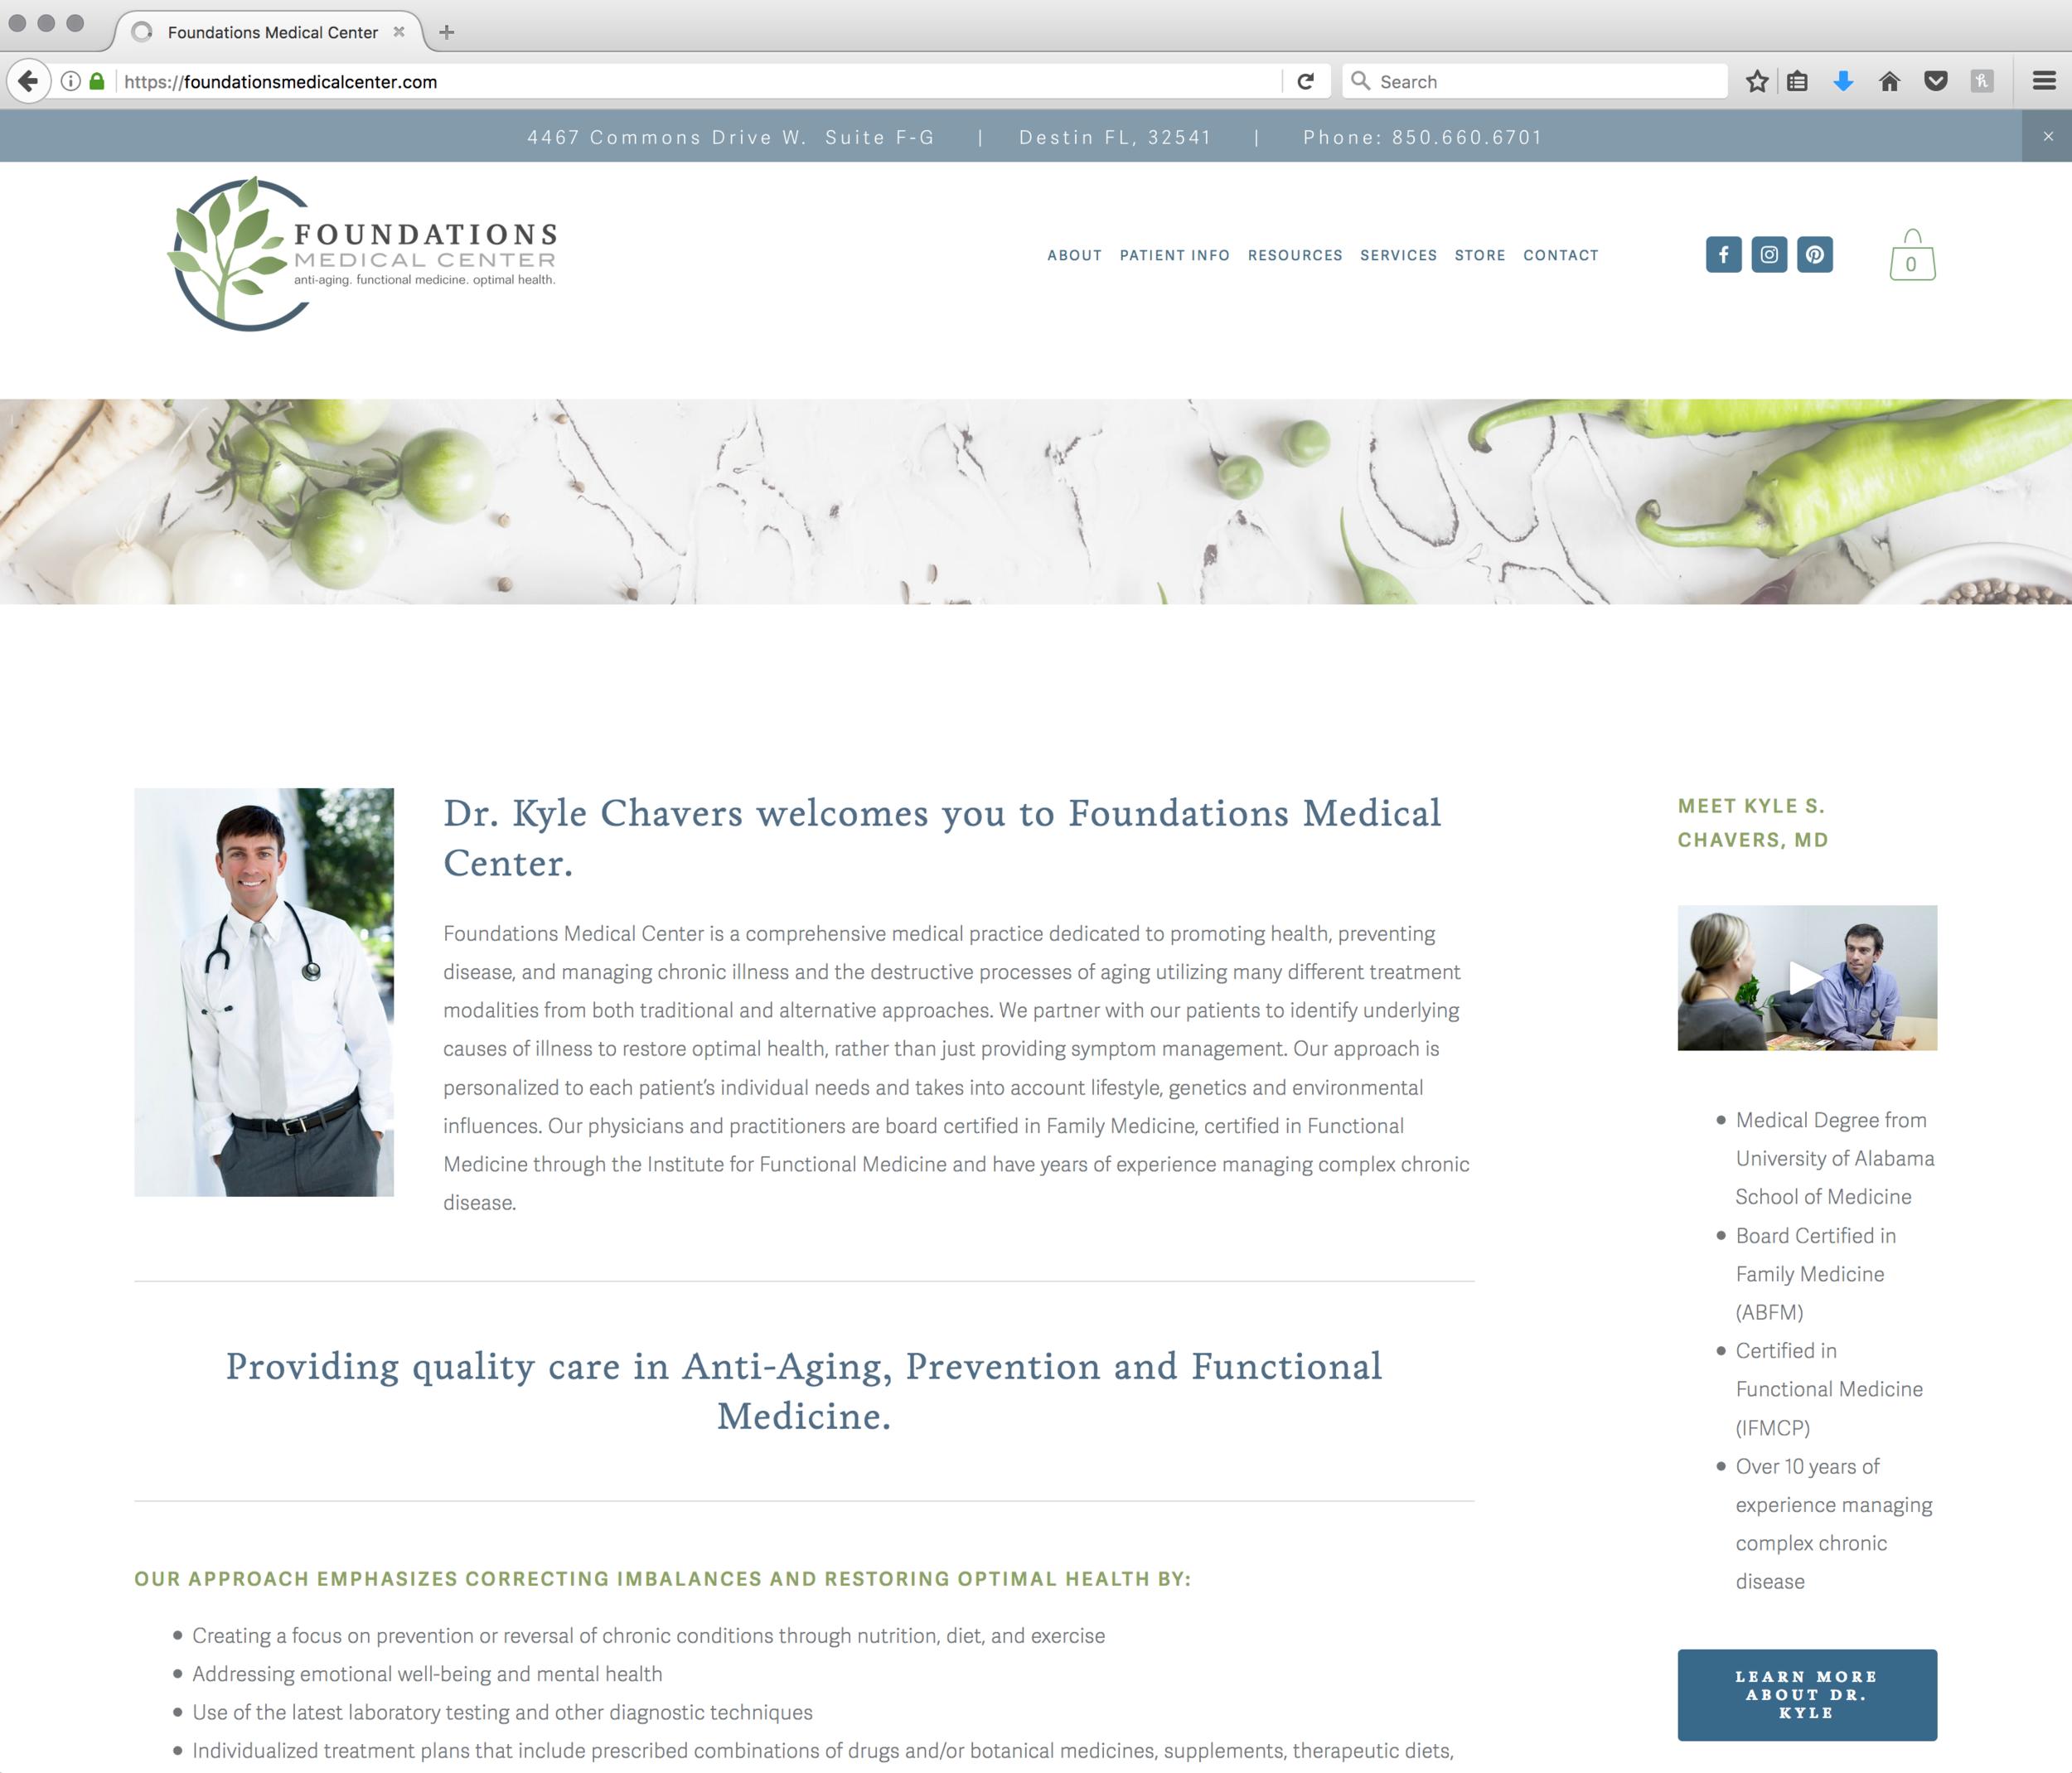 Foundations Medical Center